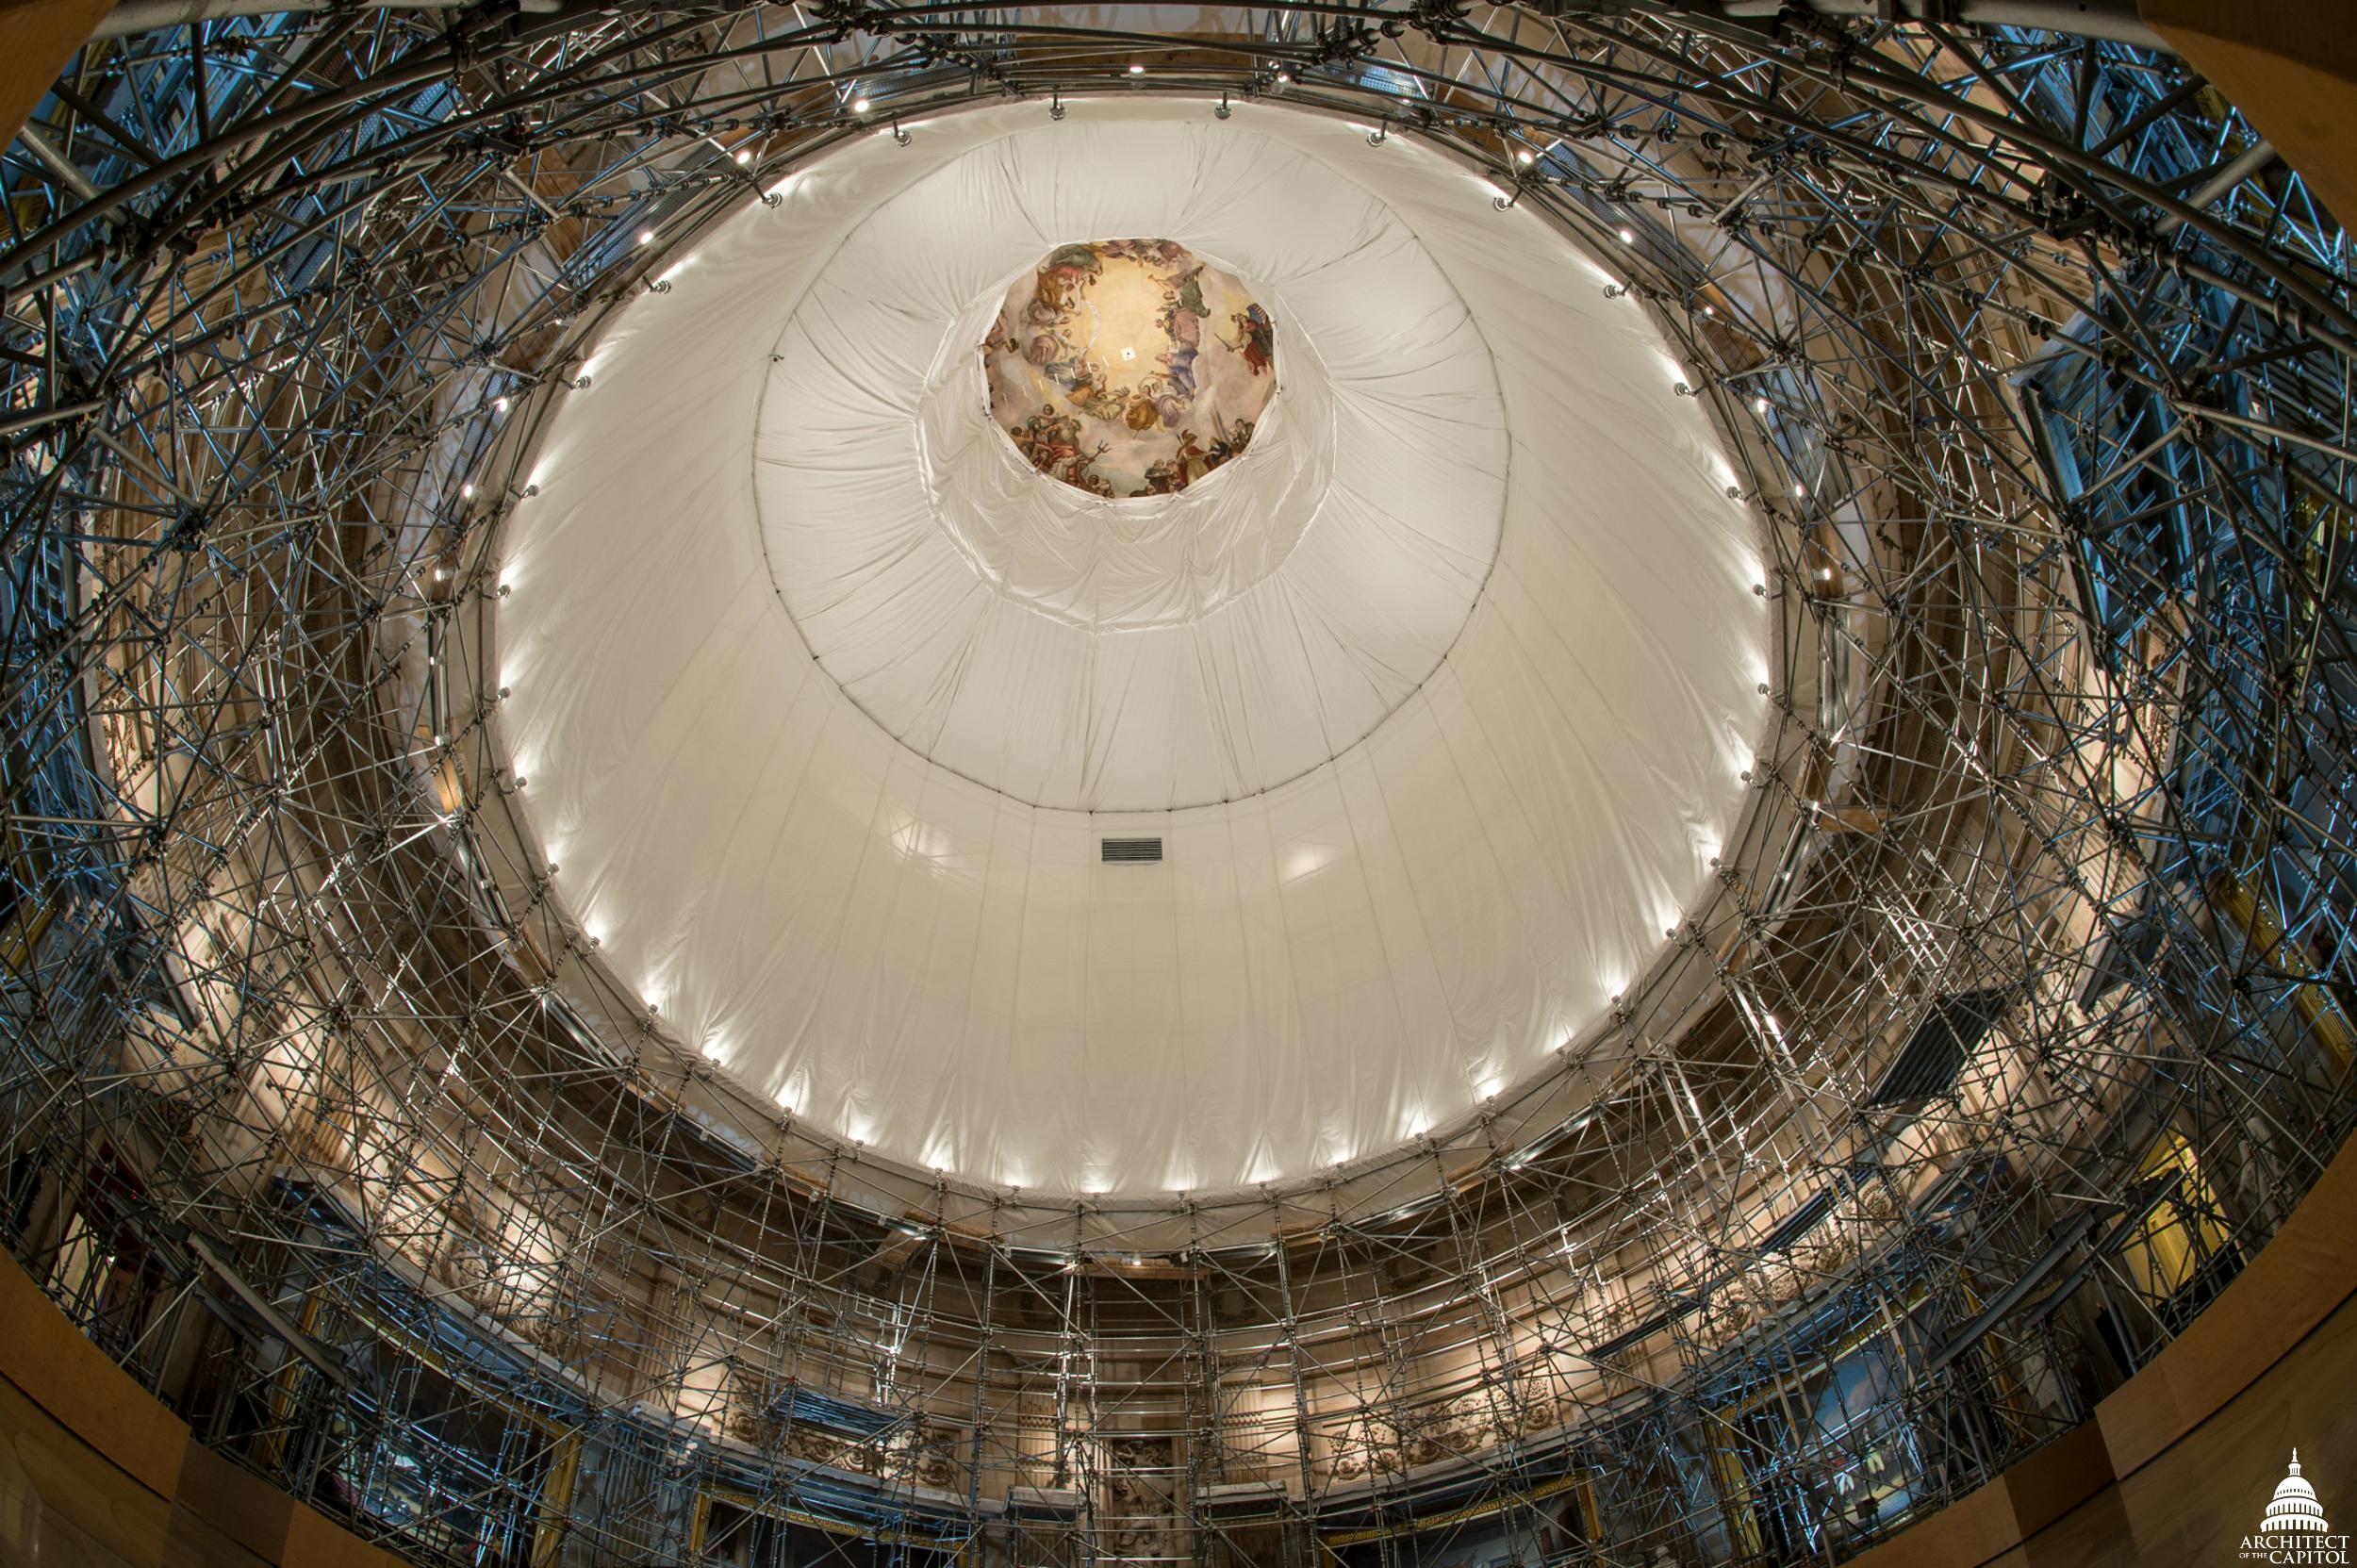 In the U.S. Capitol Rotunda, looking up towards the Apotheosis of Washington.